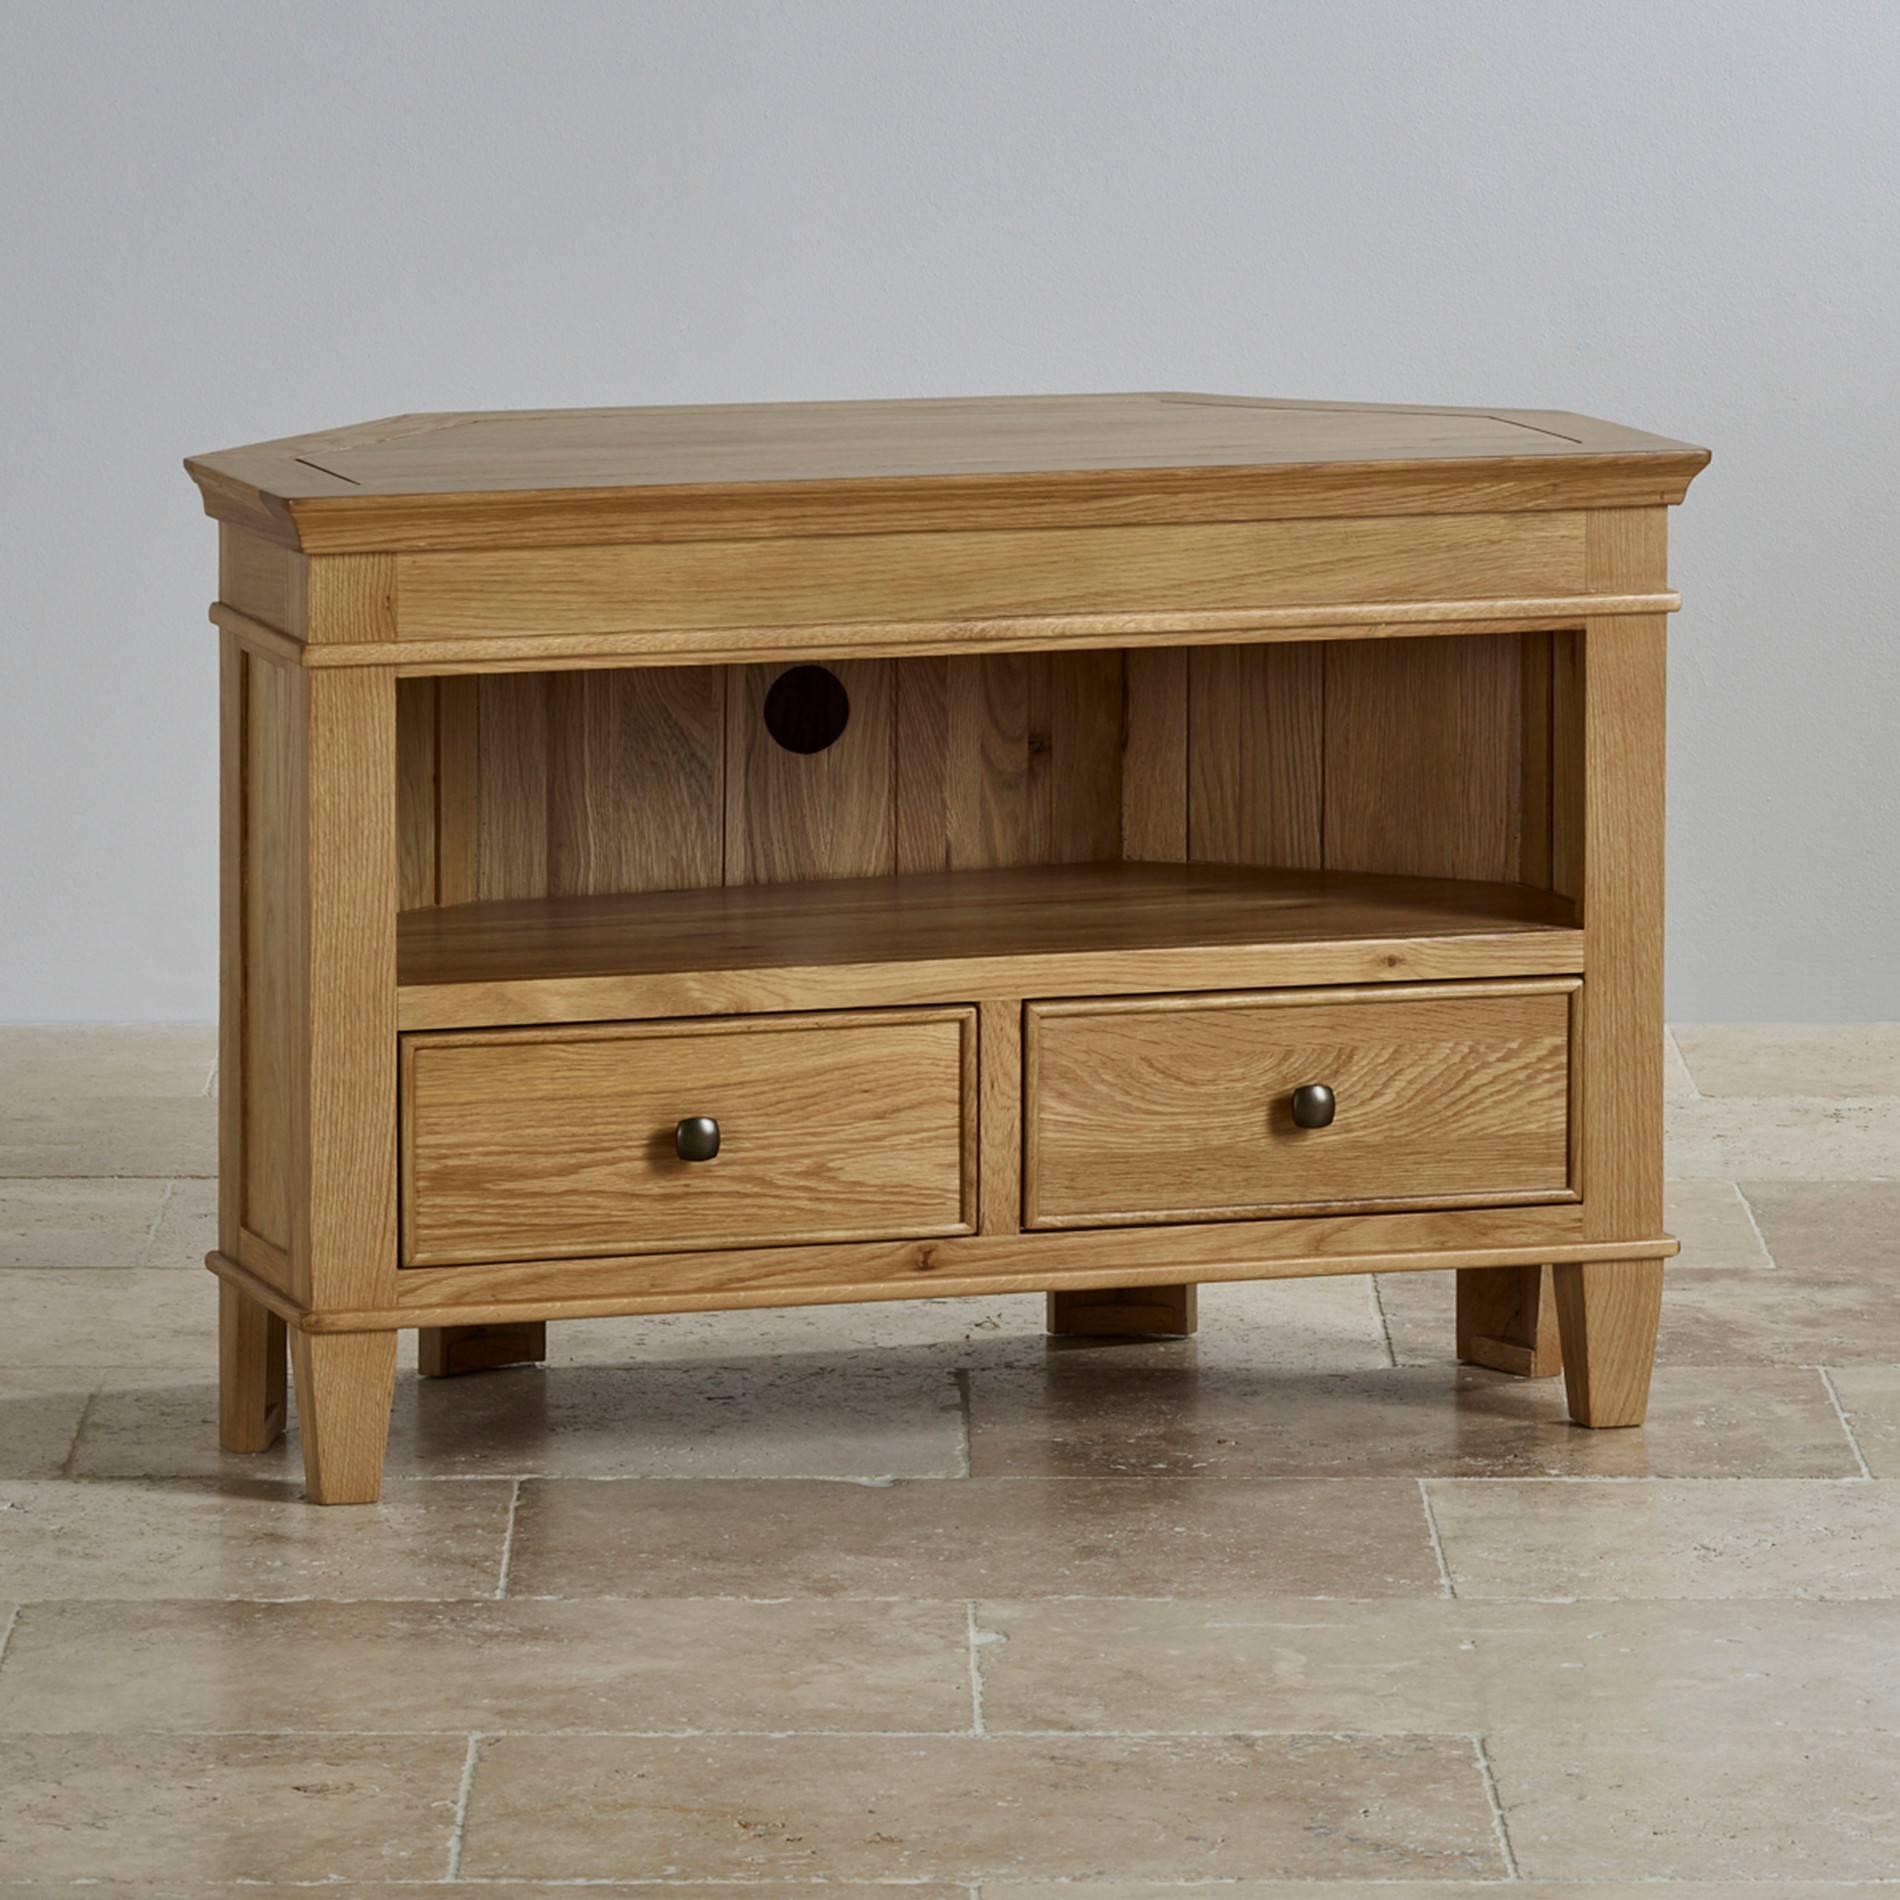 Classic Corner Tv Cabinet In Solid Oak | Oak Furniture Land with regard to Oak Corner Tv Cabinets (Image 2 of 15)